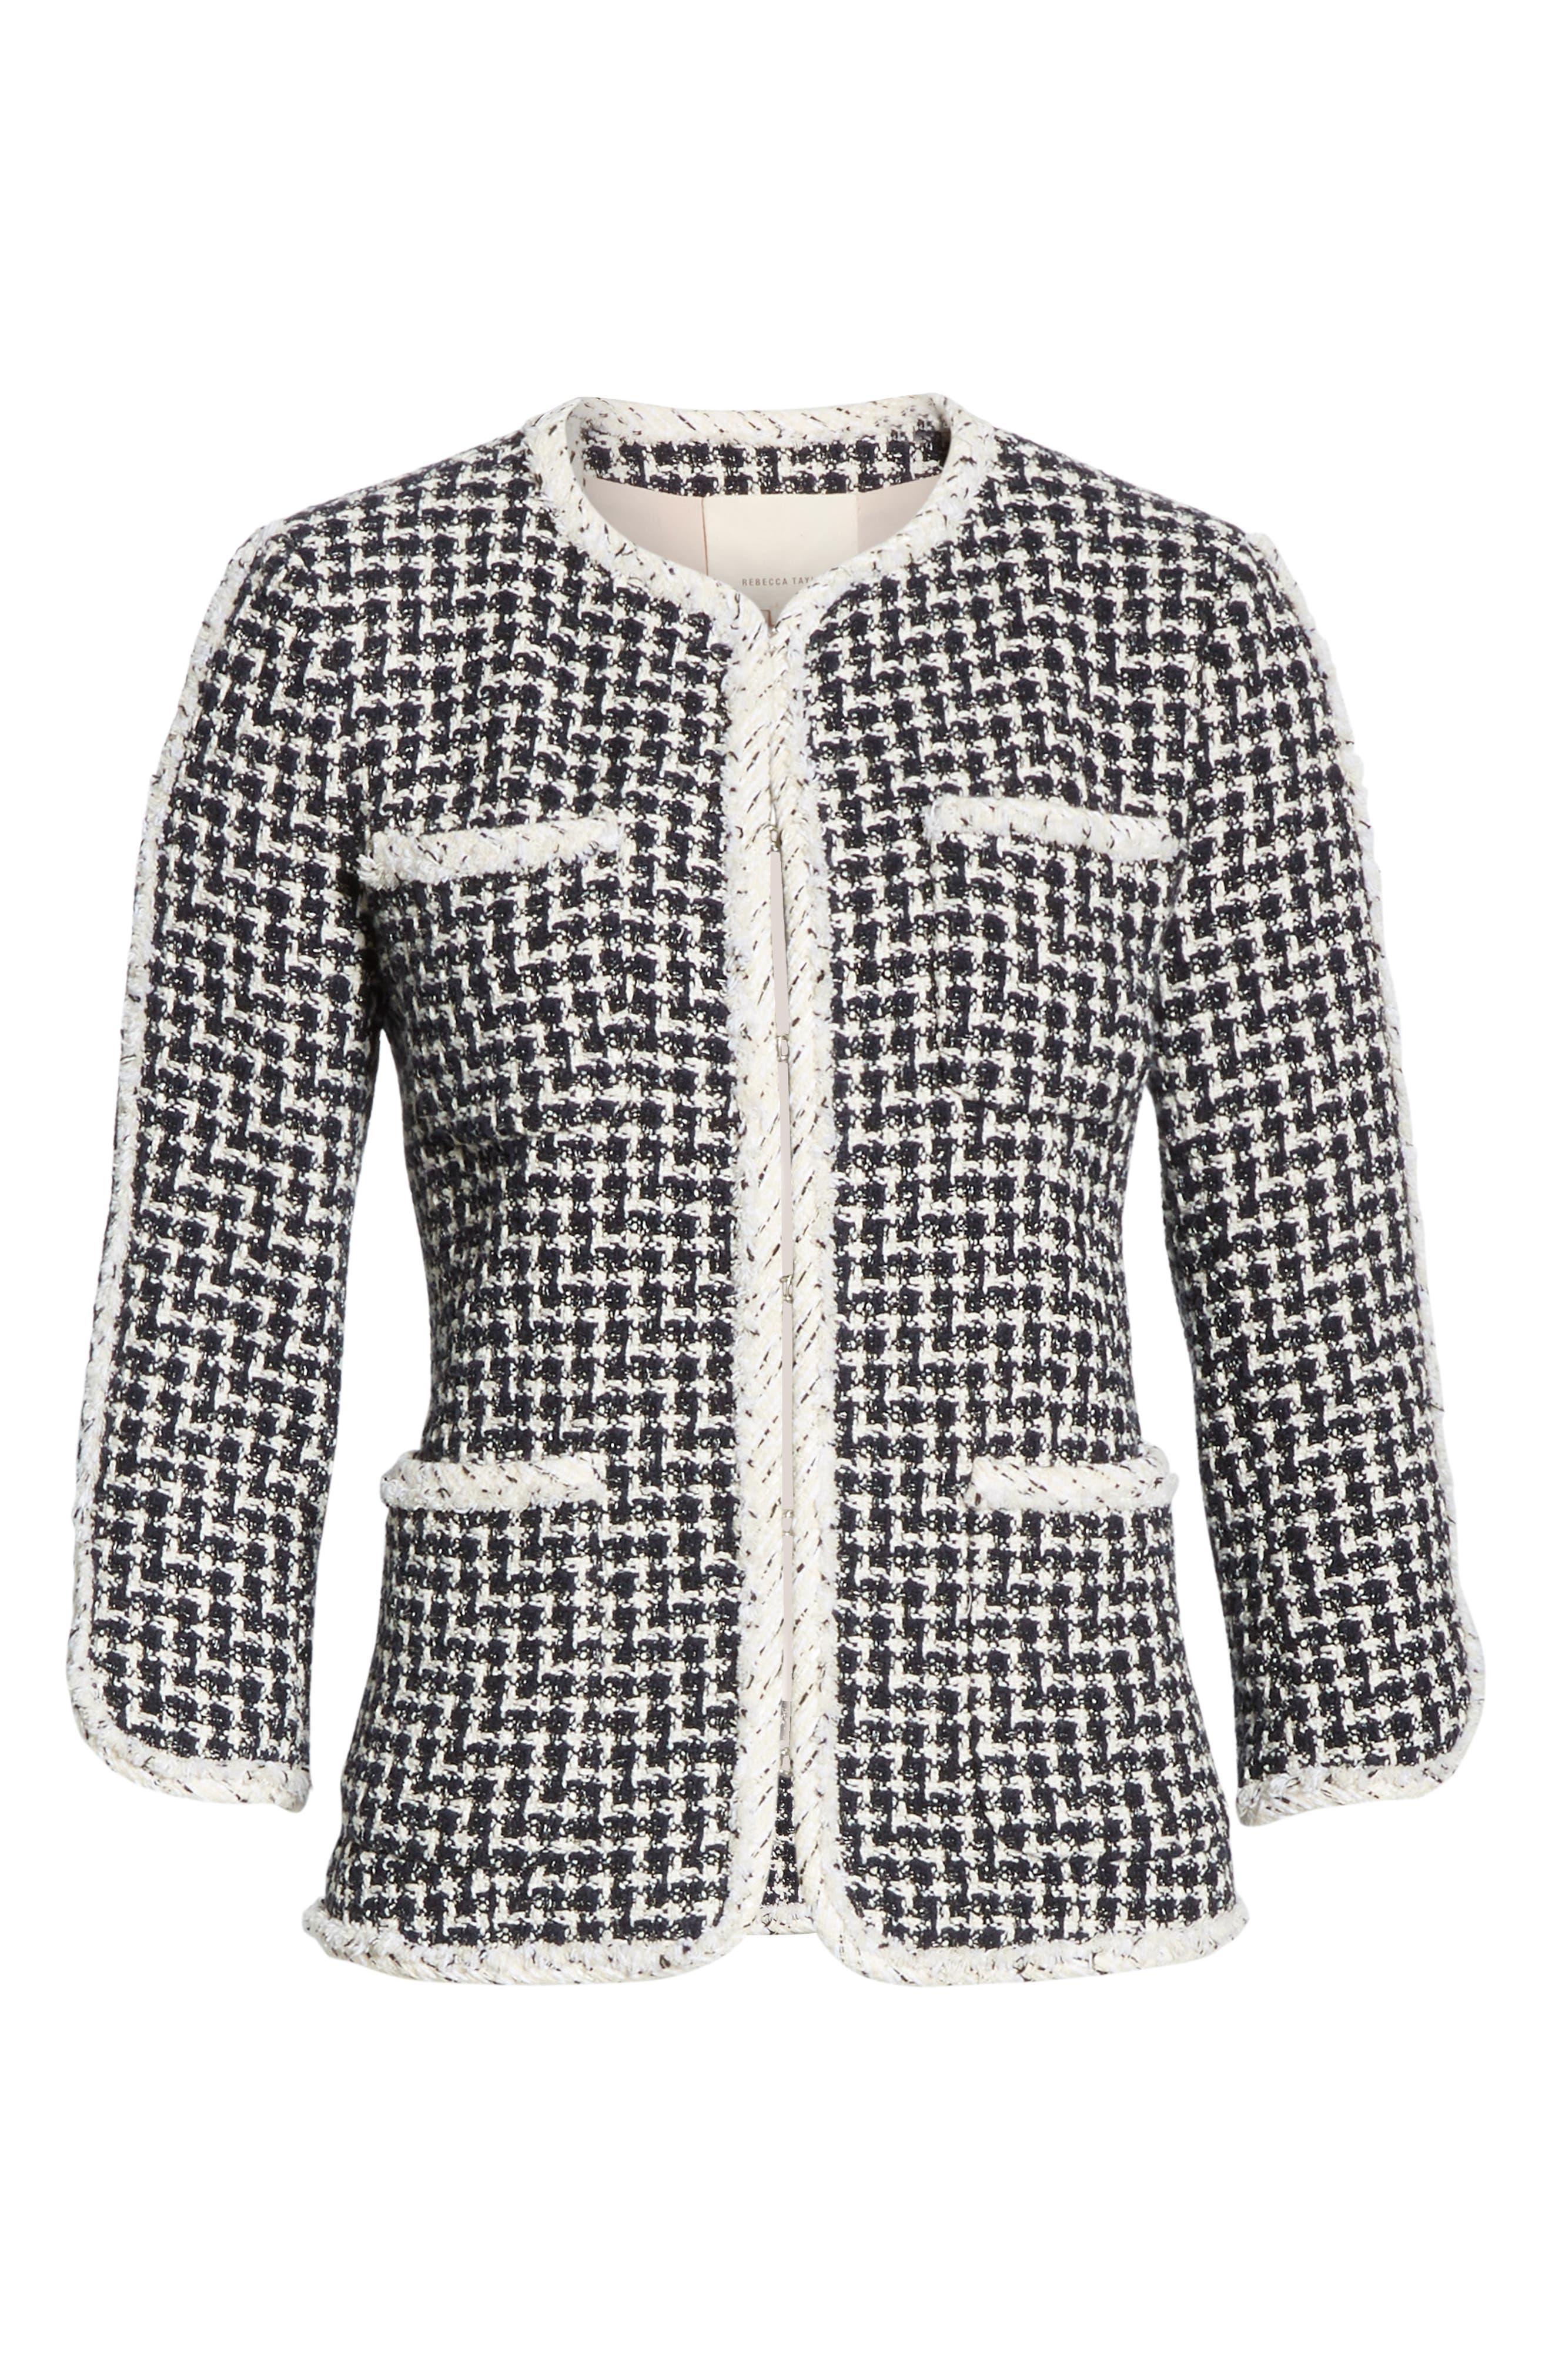 REBECCA TAYLOR, Tweed Jacket, Alternate thumbnail 6, color, BLACK COMBO